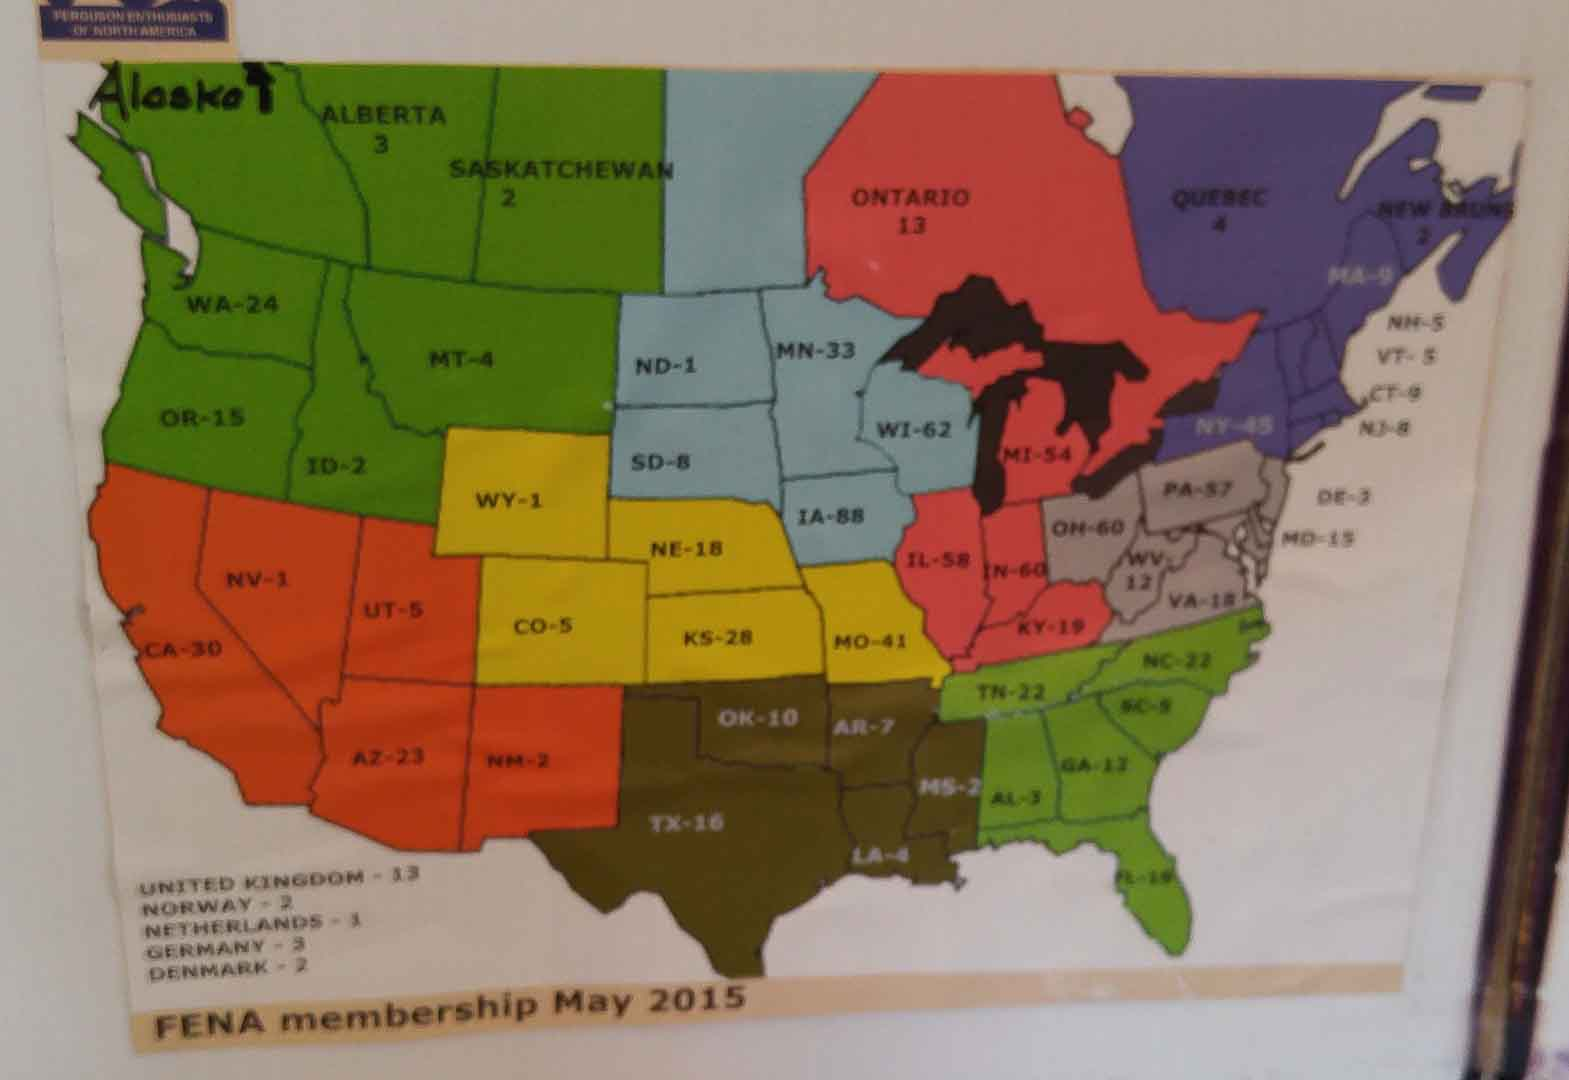 FENA membership location poster.